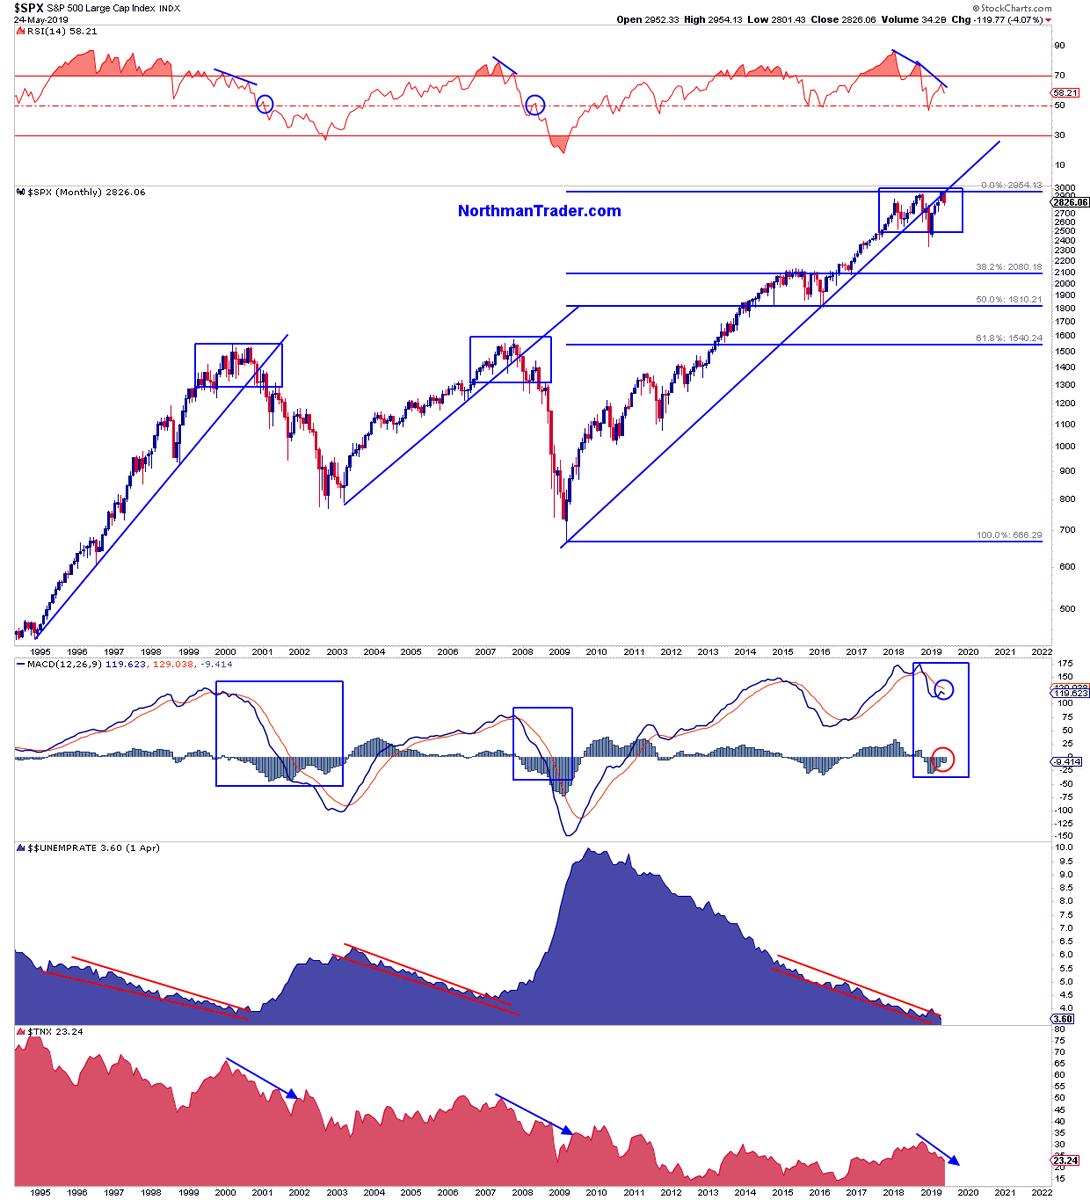 Sven Henrich S&P 500 chart